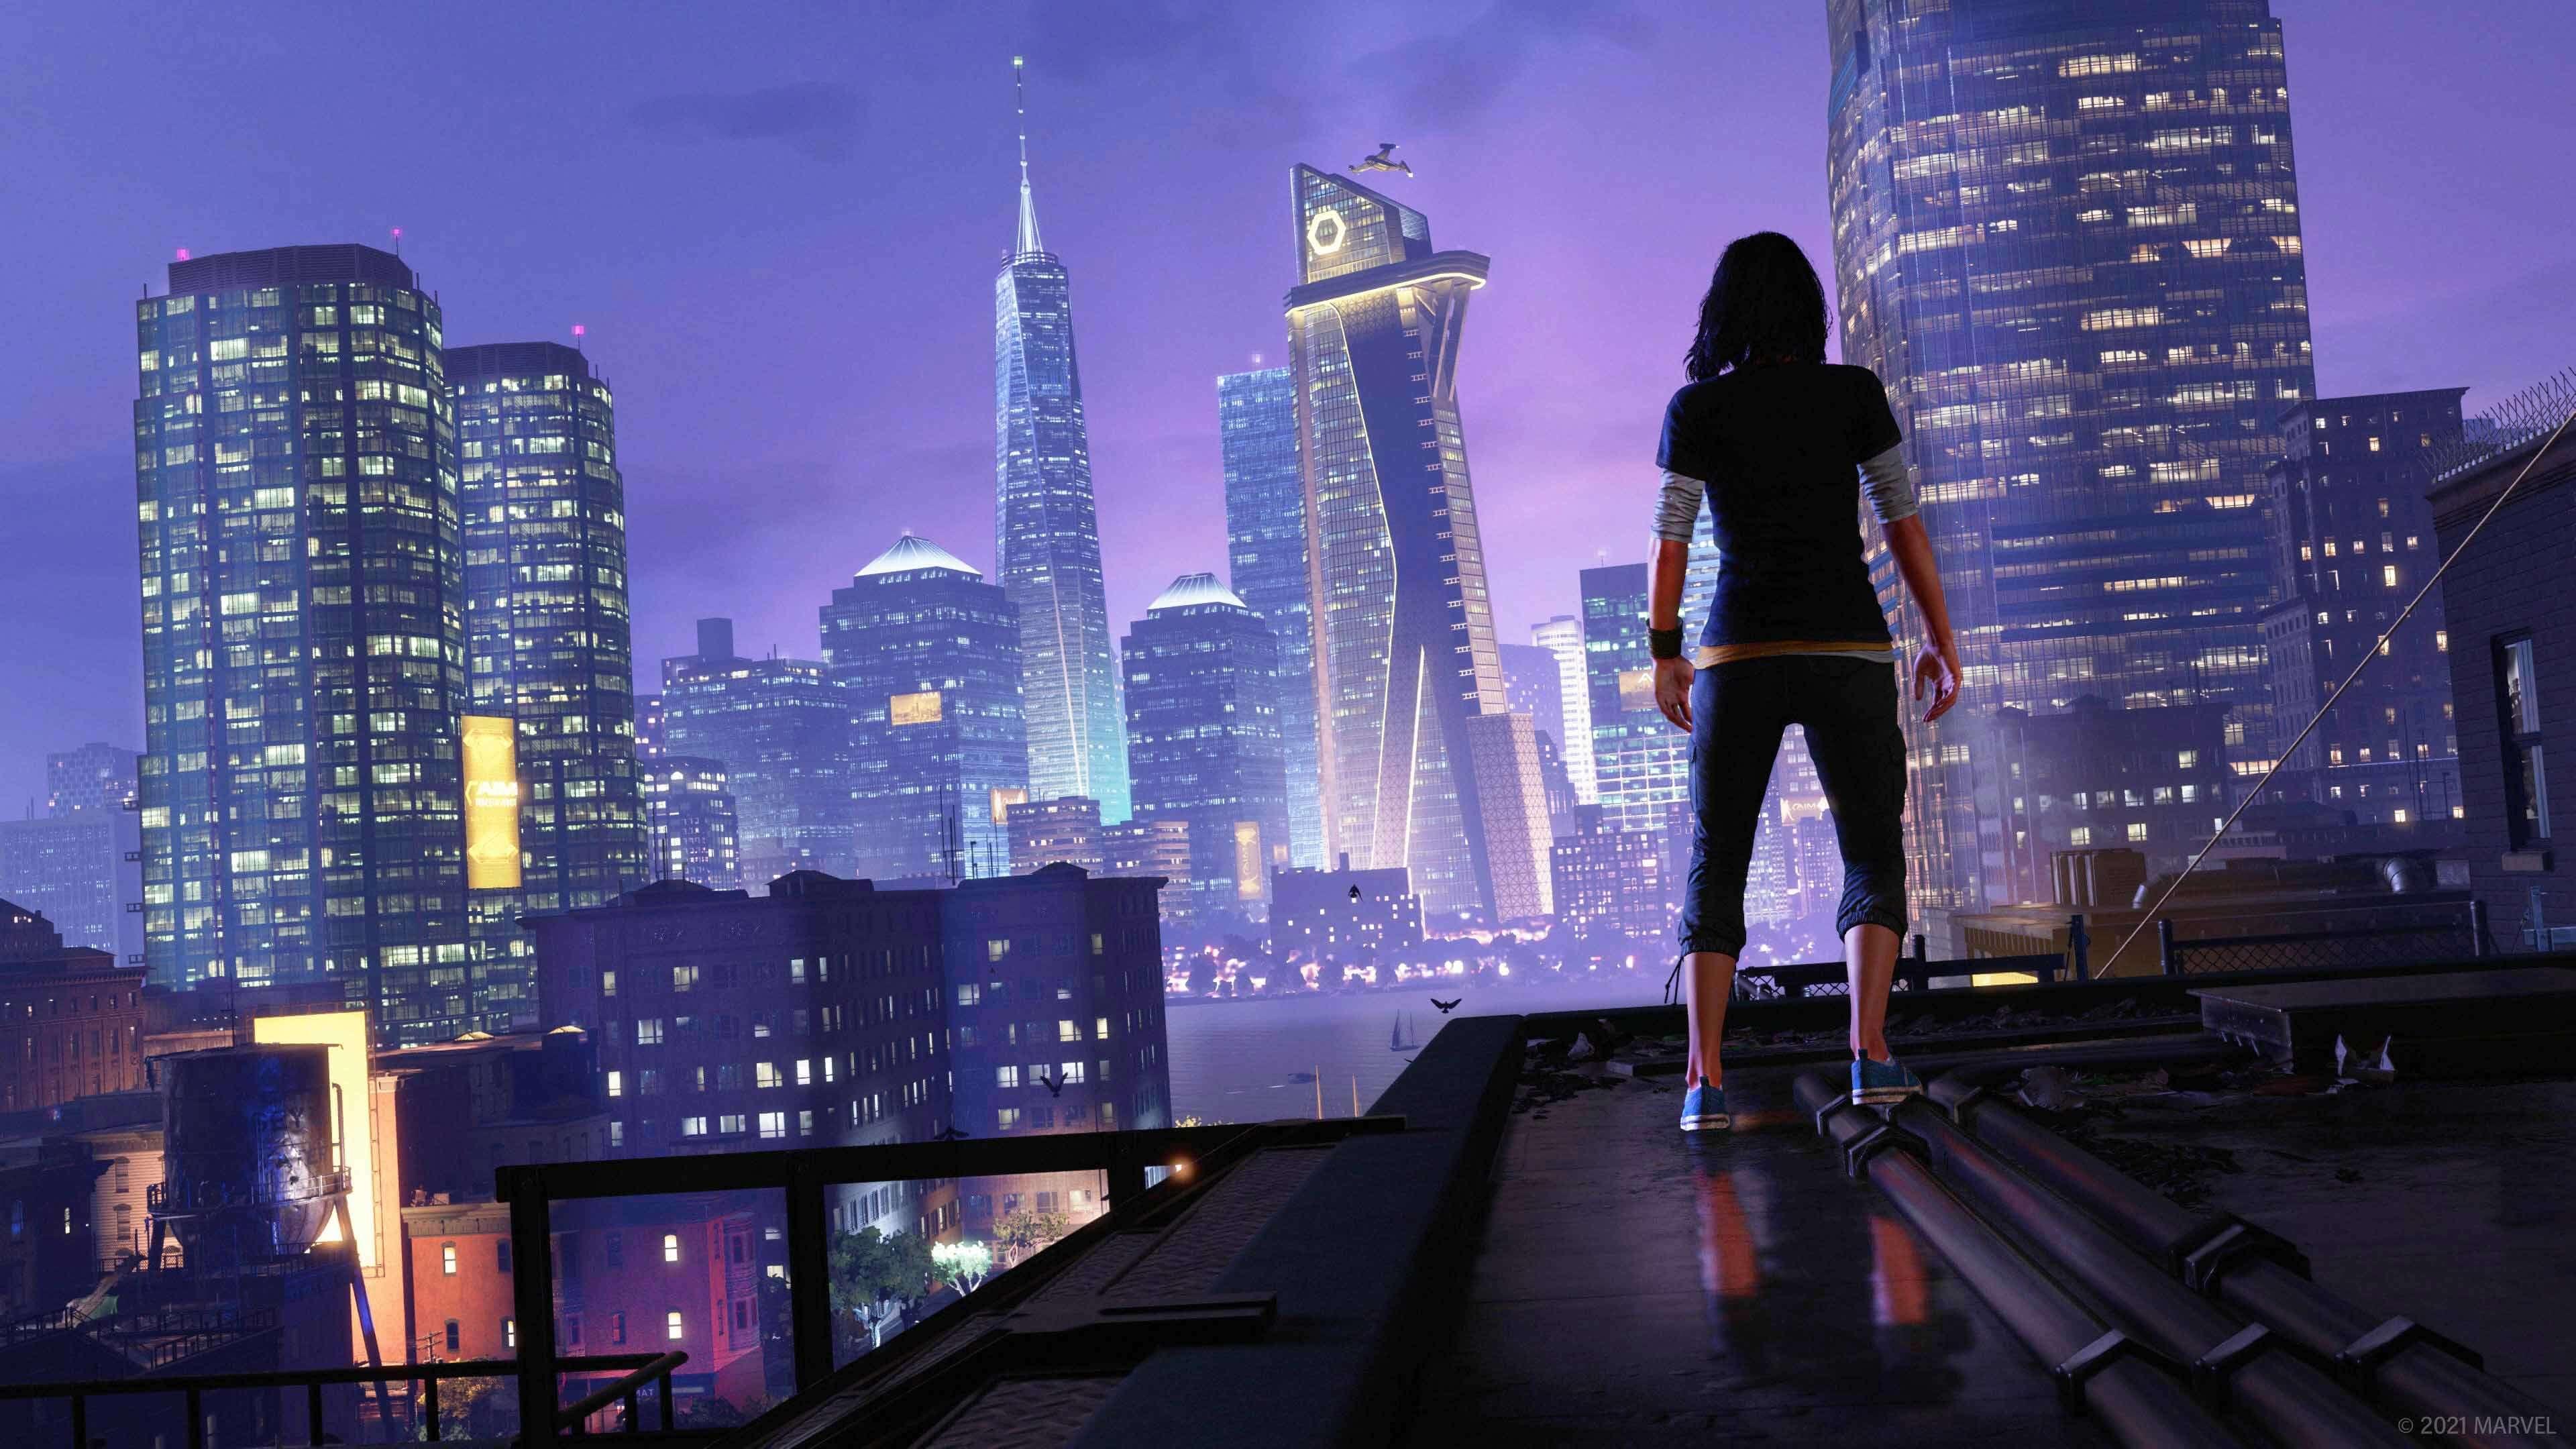 Marvel's avengers steam oyun inceleme süper kahraman oyunu